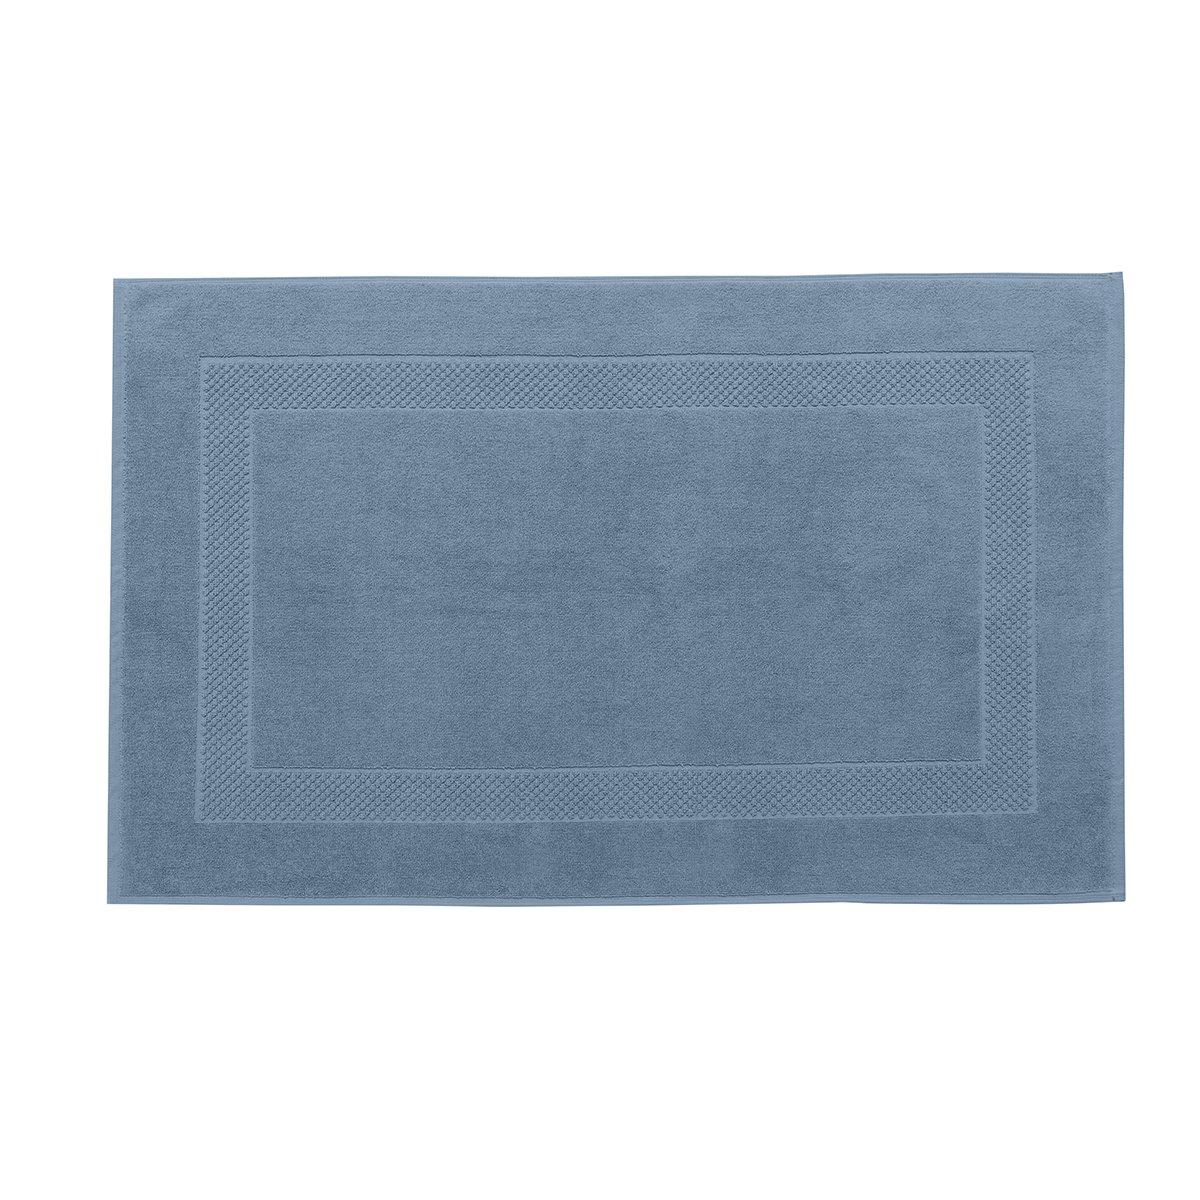 Tapis de bain coton 60x80 cm gentiane